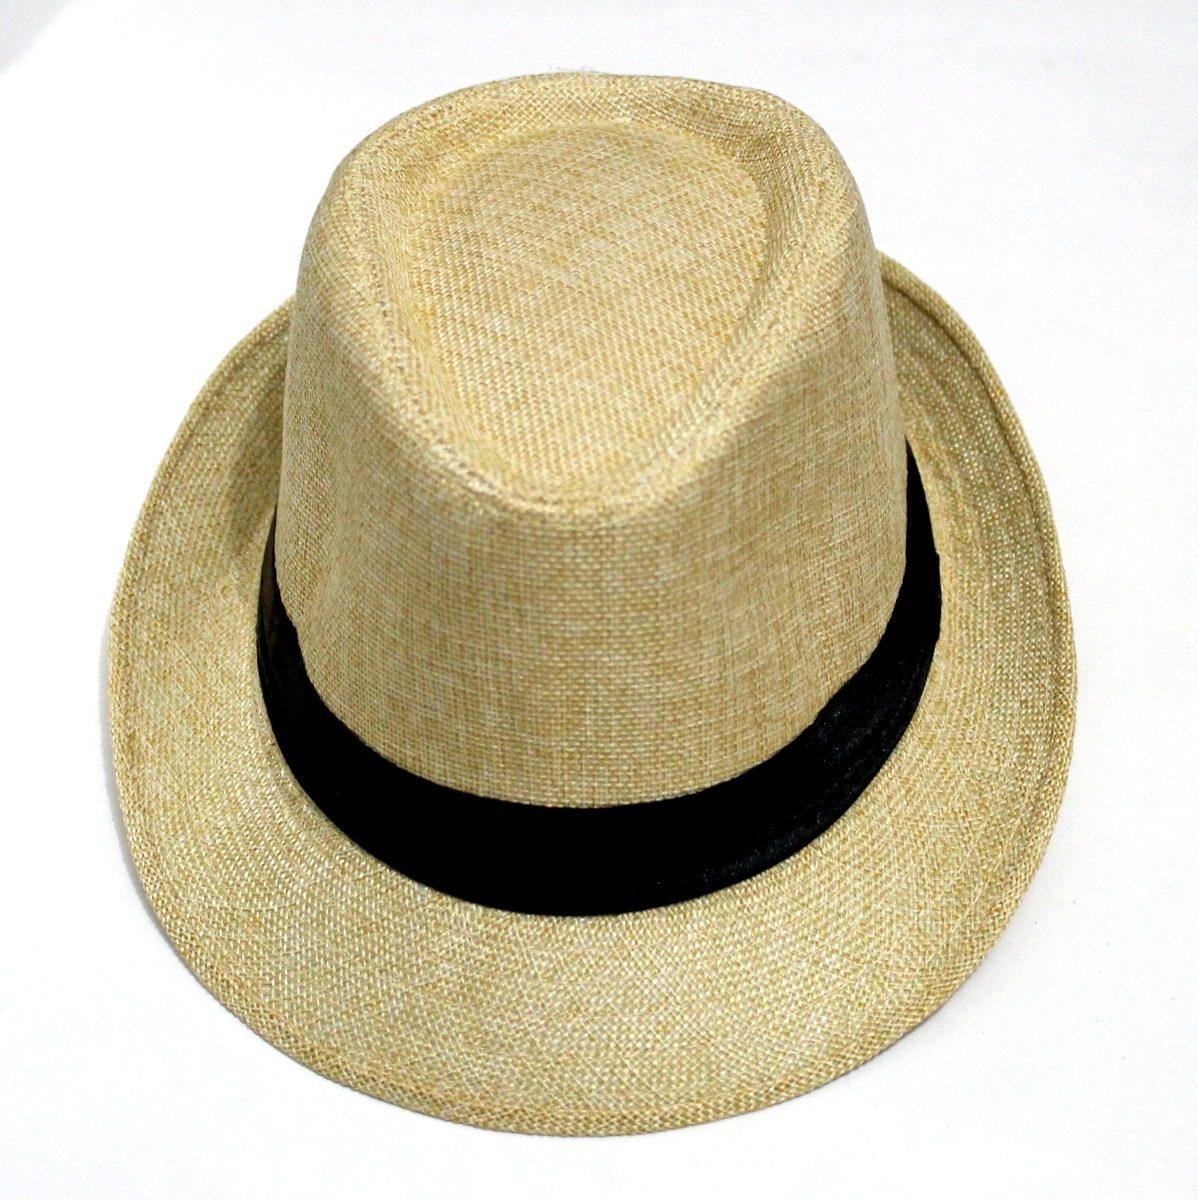 731a4869d64ba chapeu moda panama casual praia masculino feminino oferta. Carregando zoom.